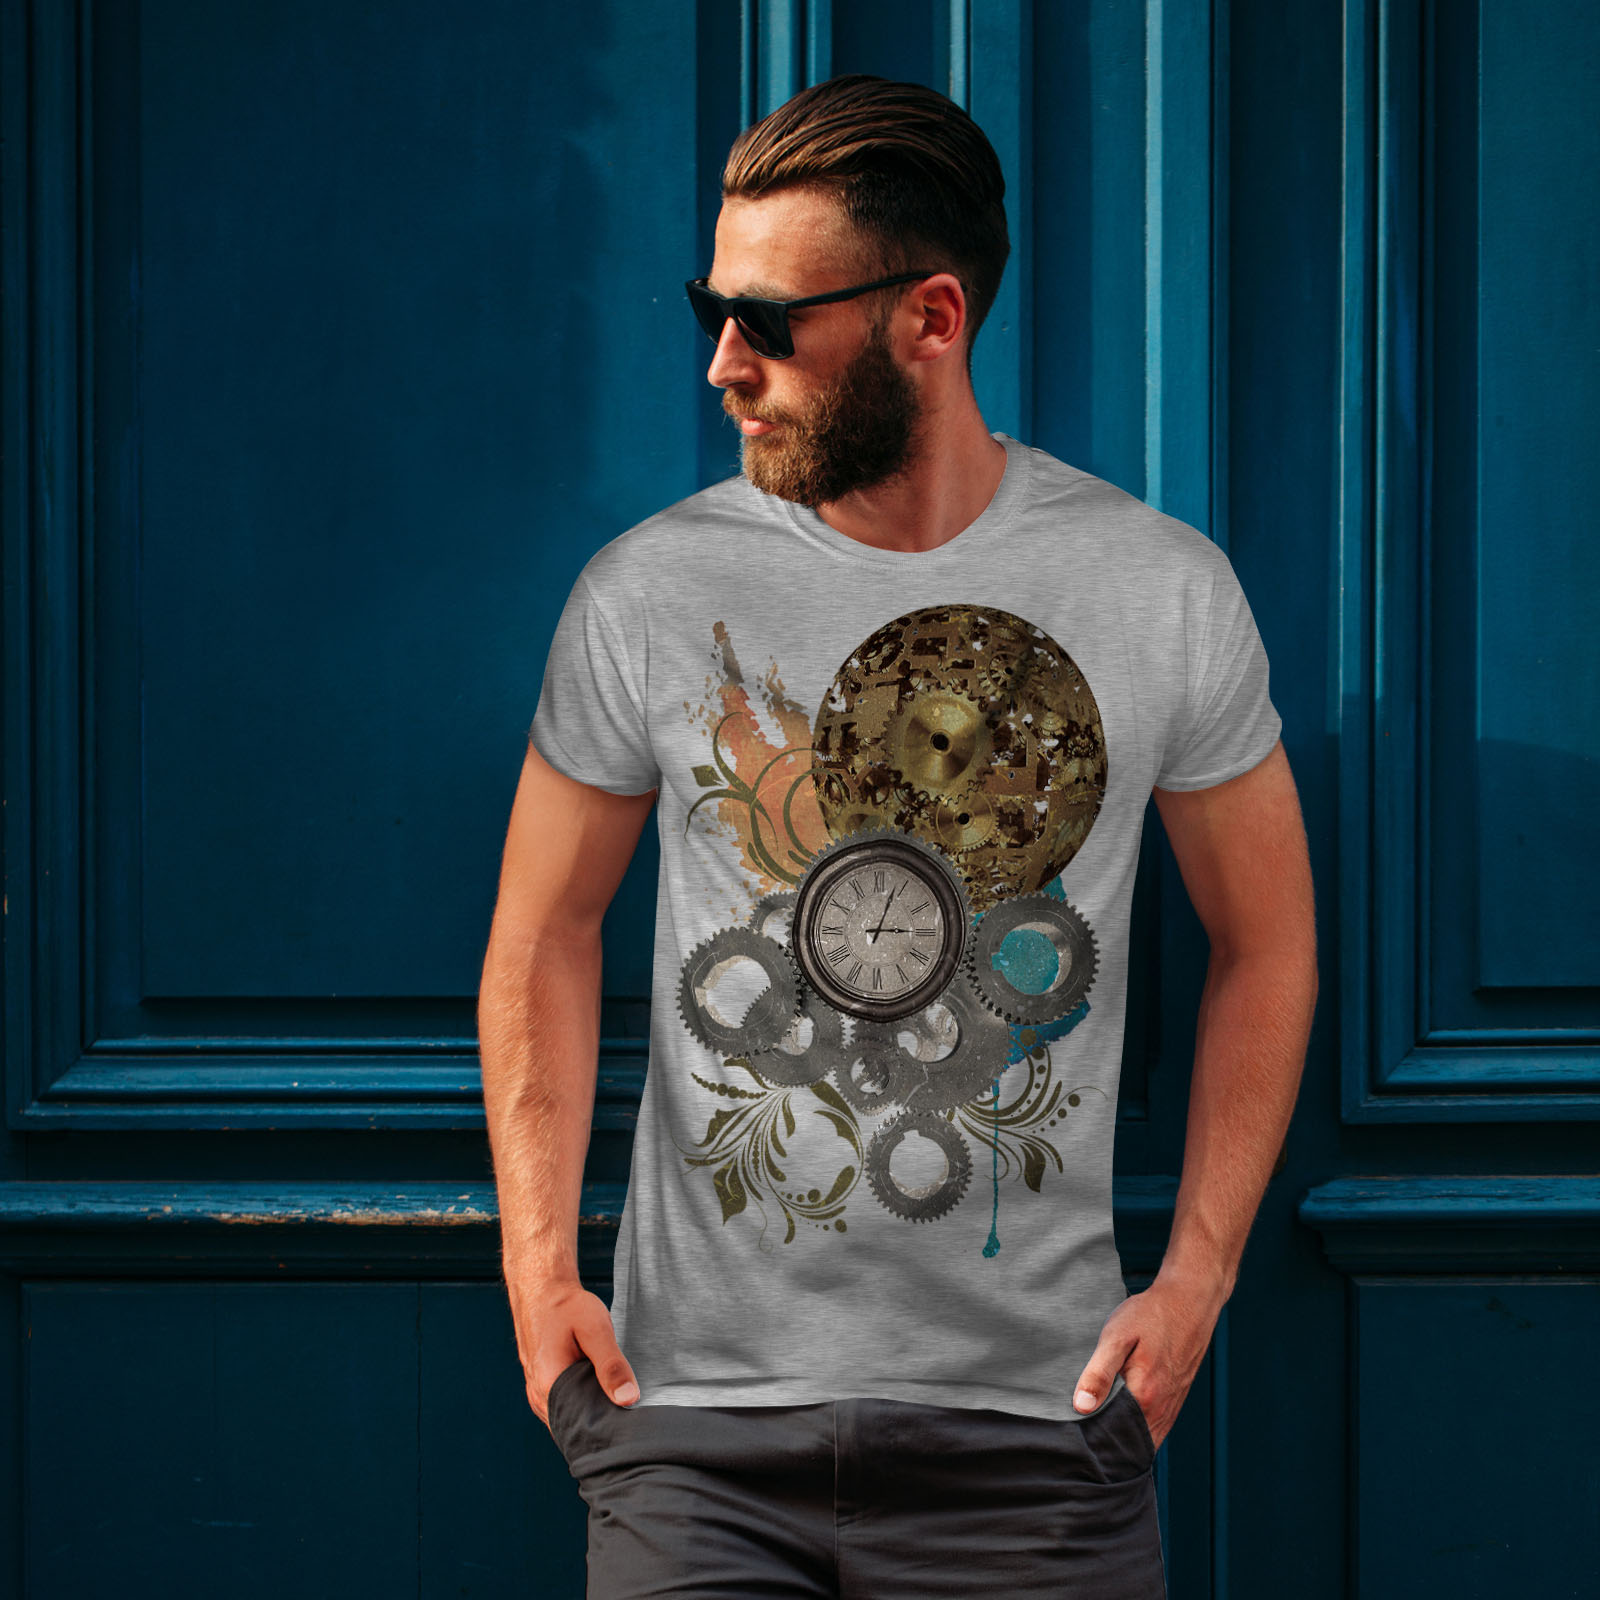 Wellcoda-Clock-Cool-Print-Mens-T-shirt-Illusion-Graphic-Design-Printed-Tee thumbnail 16